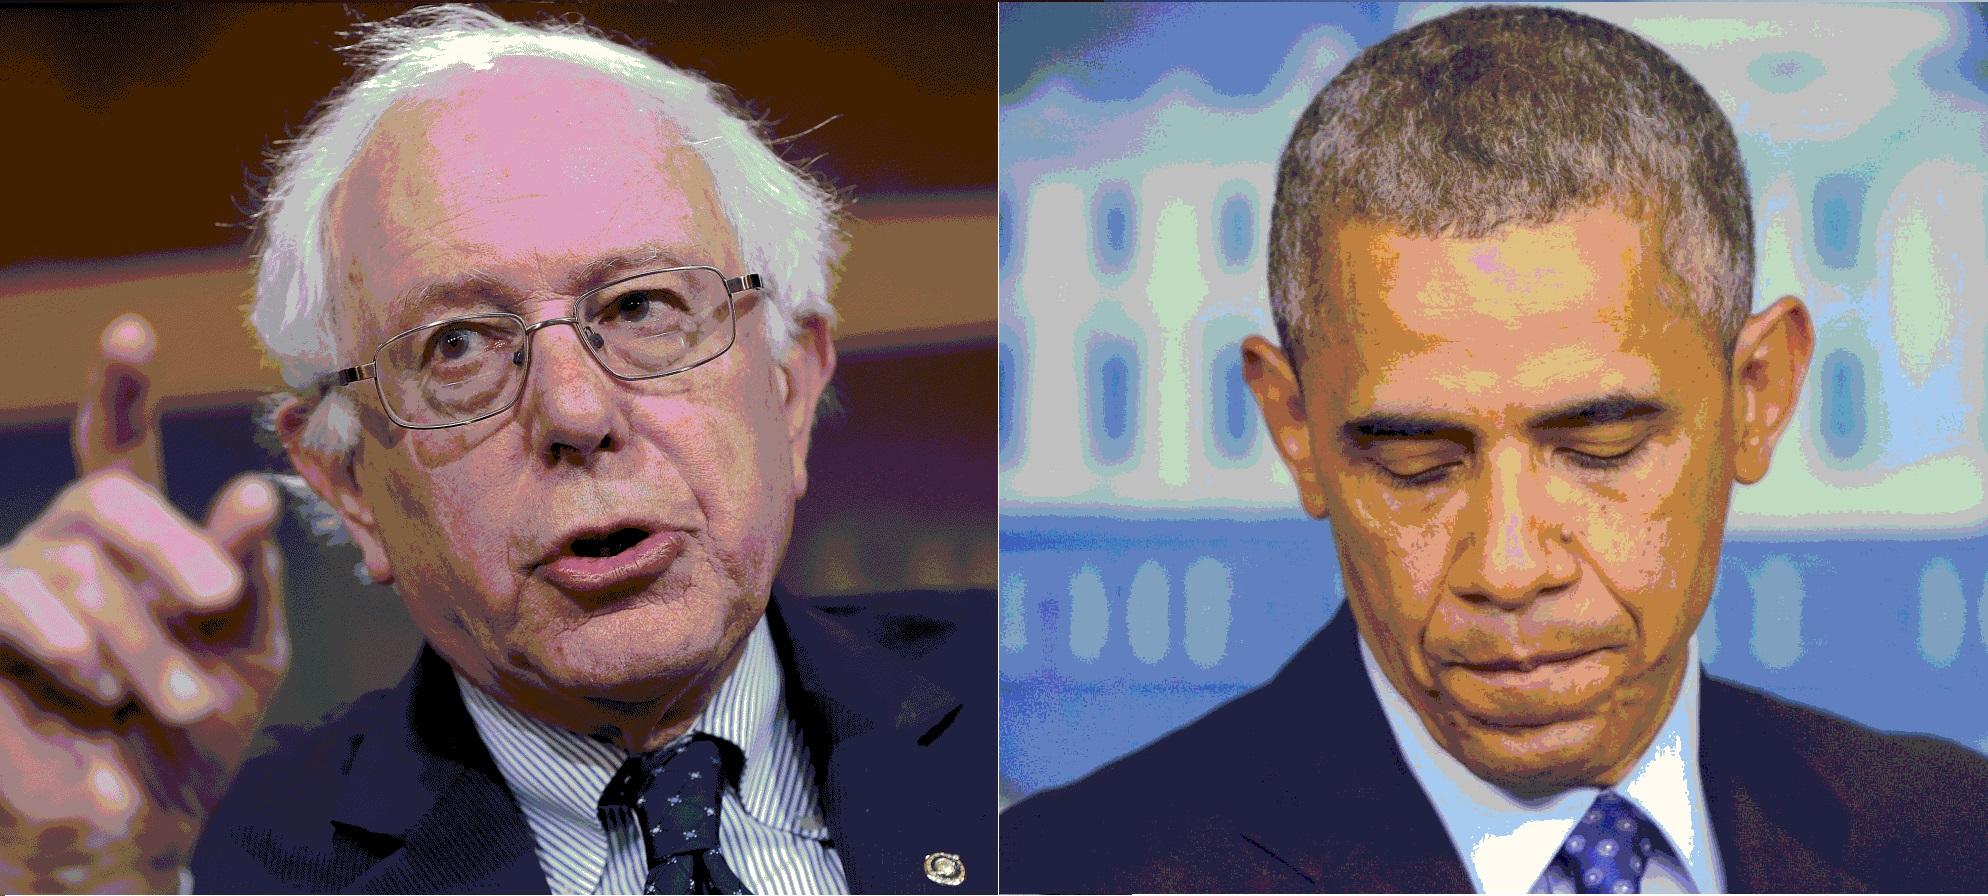 greatest presidential mistake, Obama, Sanders